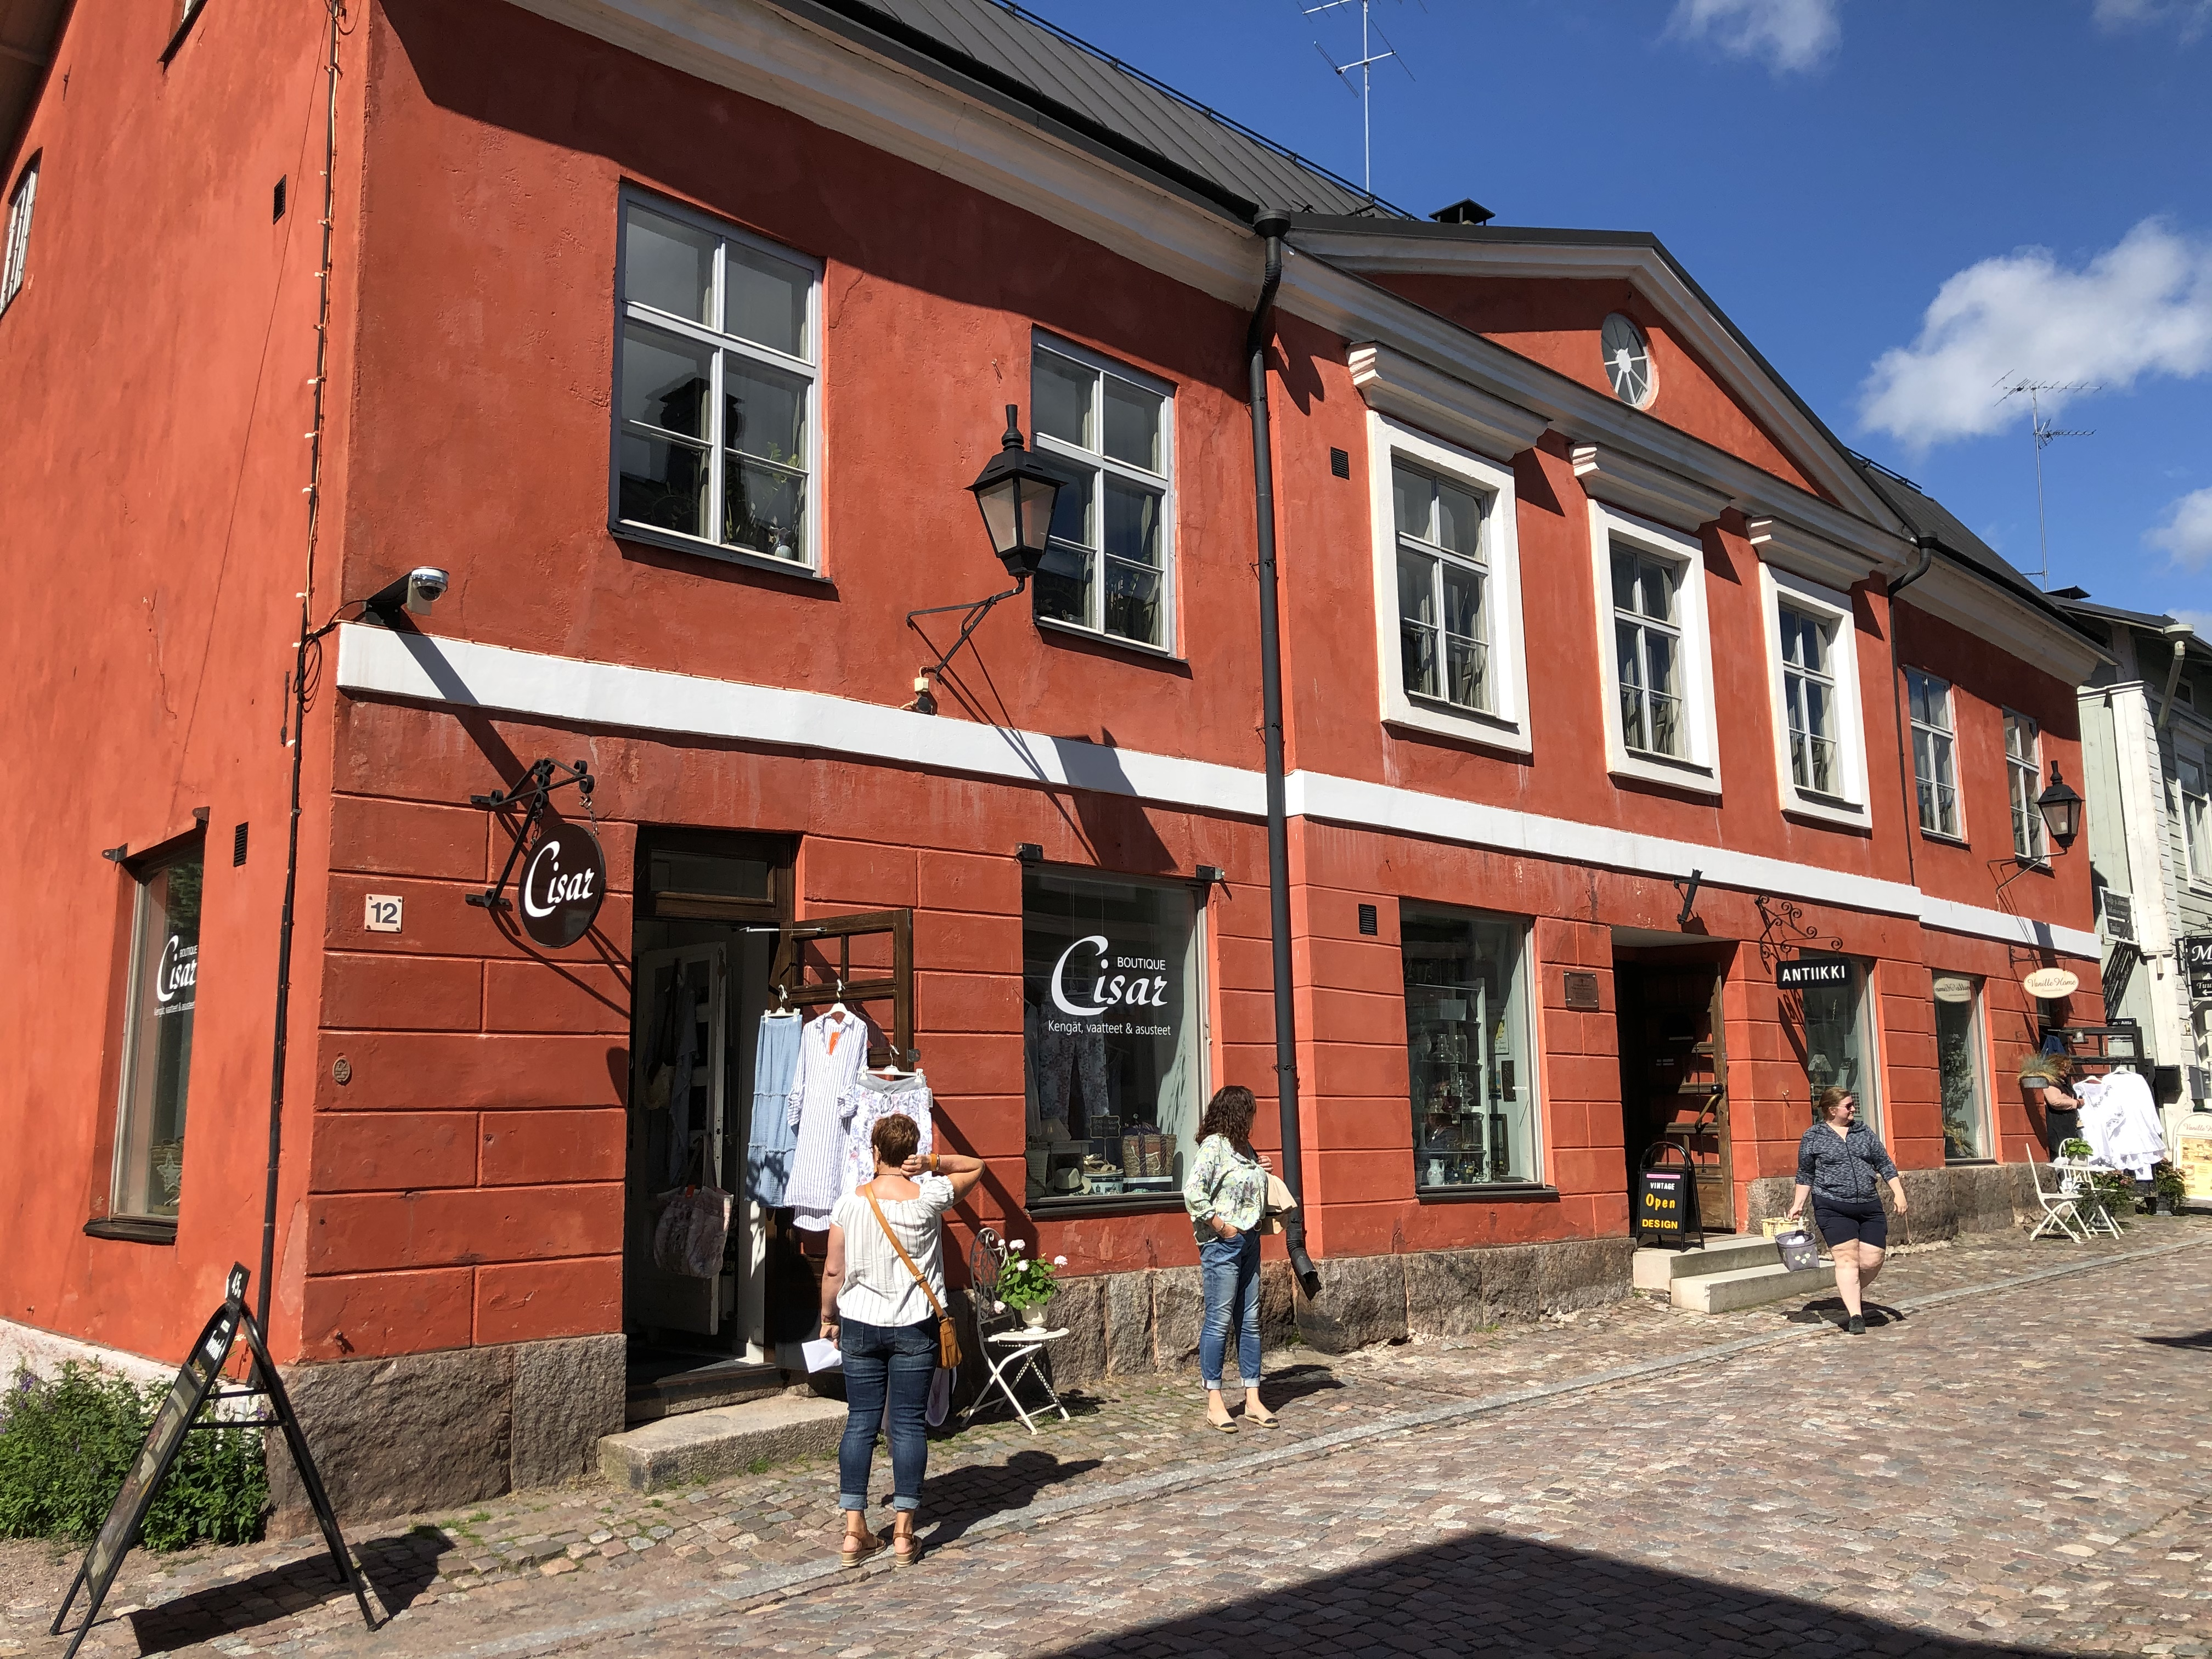 Porvoon ruokapaikat ja kahvilat Porvoon linna